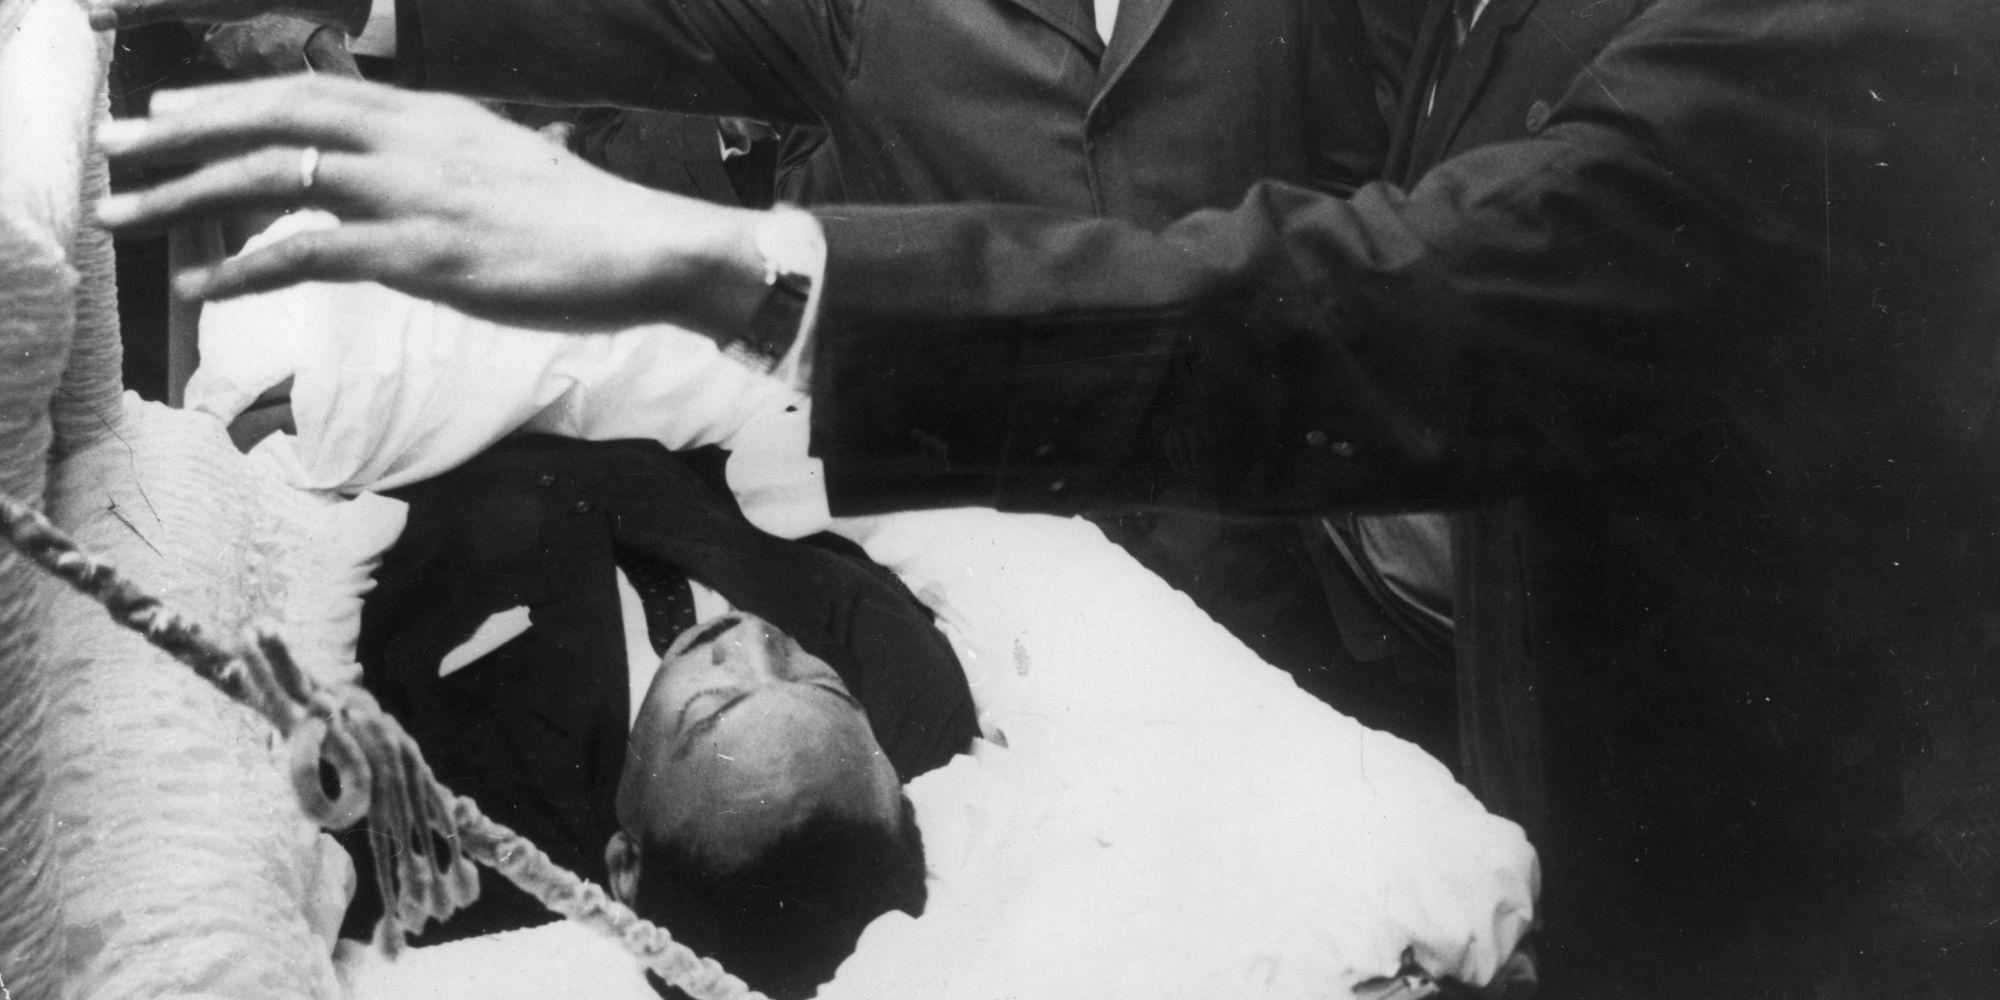 Martin Luther King Jr Dead Pictures Short Film Explores Ho...